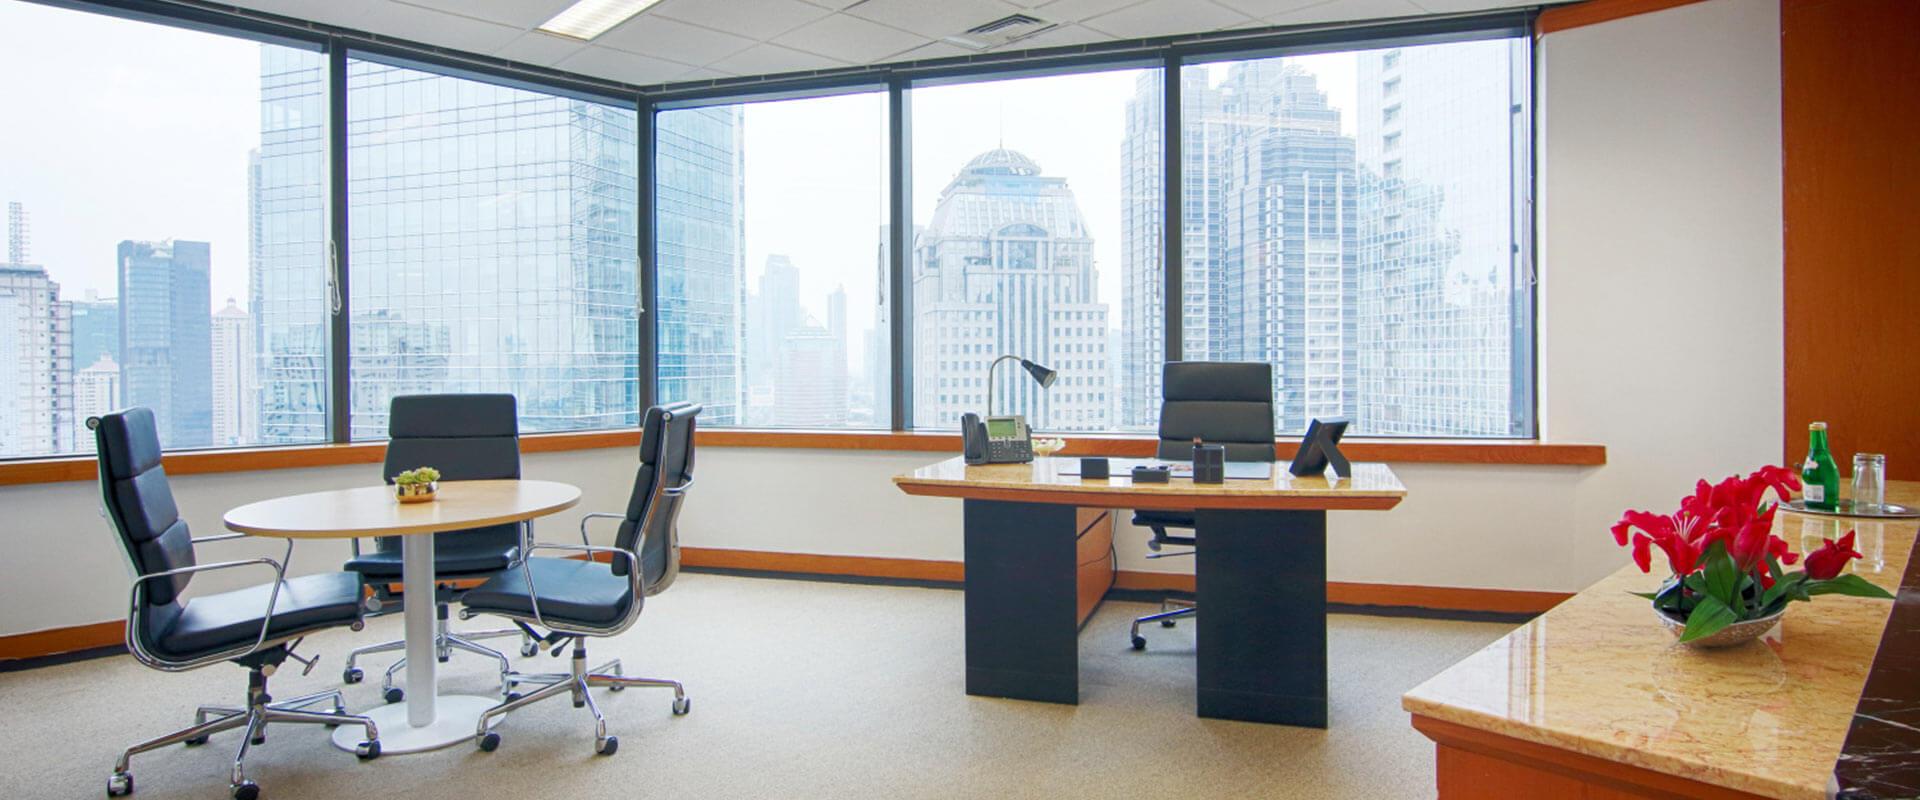 Jakarta Stock Exchange - Office Space Jakarta | Virtual Office Jakarta  Selatan